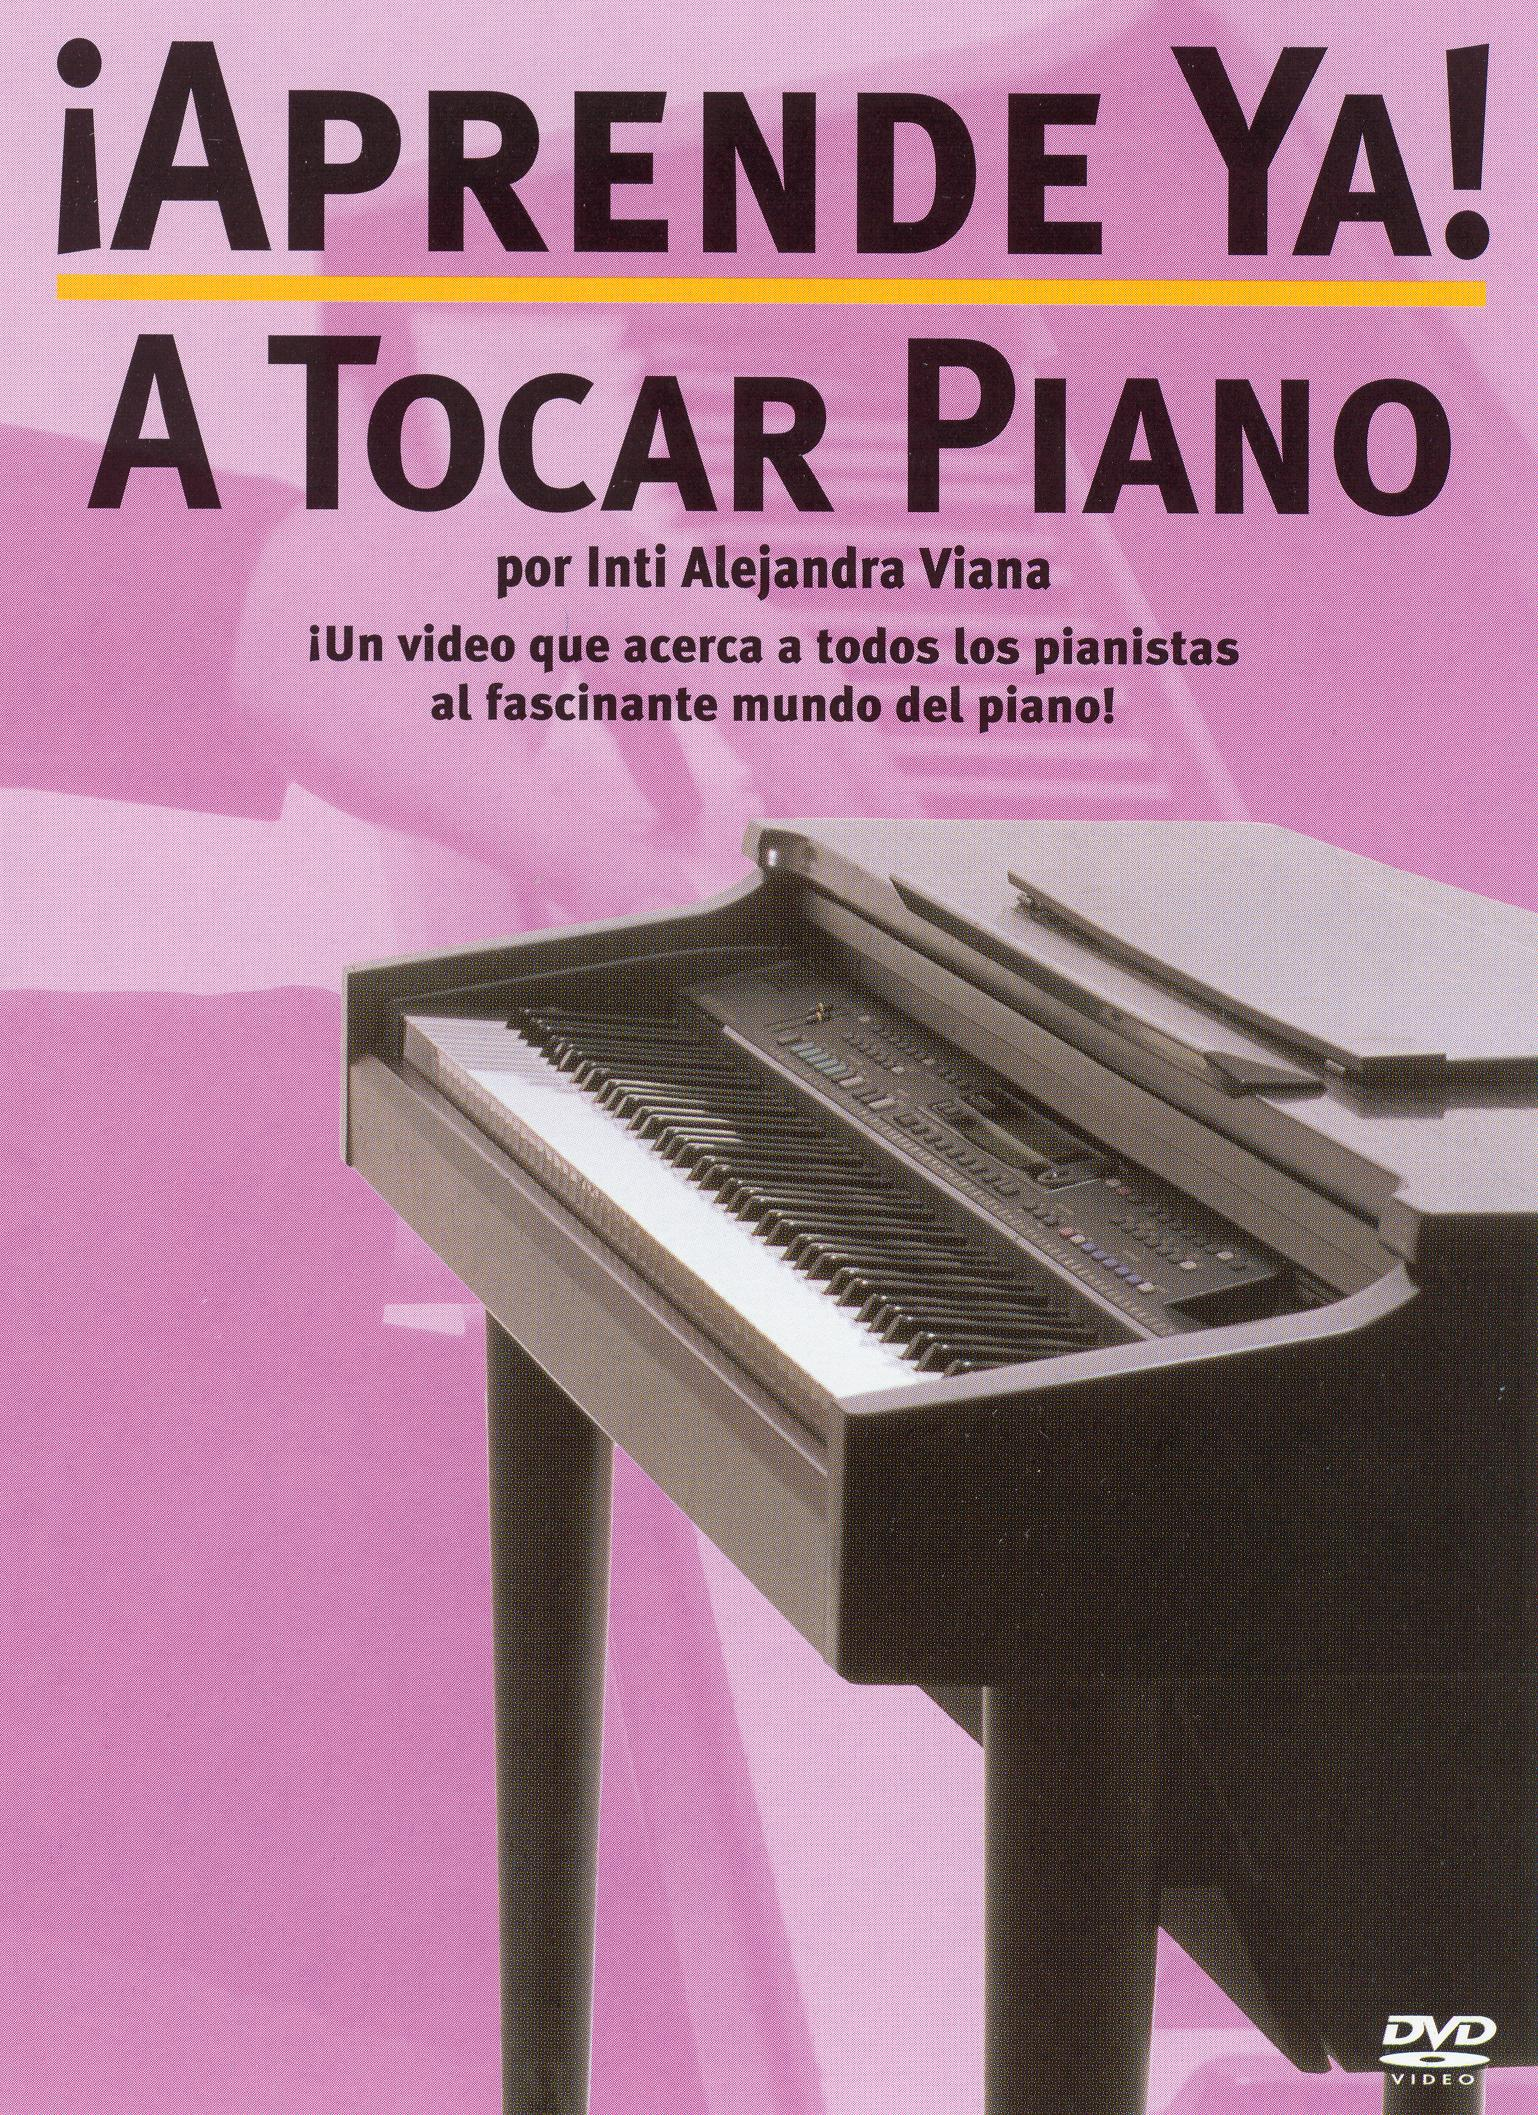 ¡Aprende Ya! A Tocar Piano